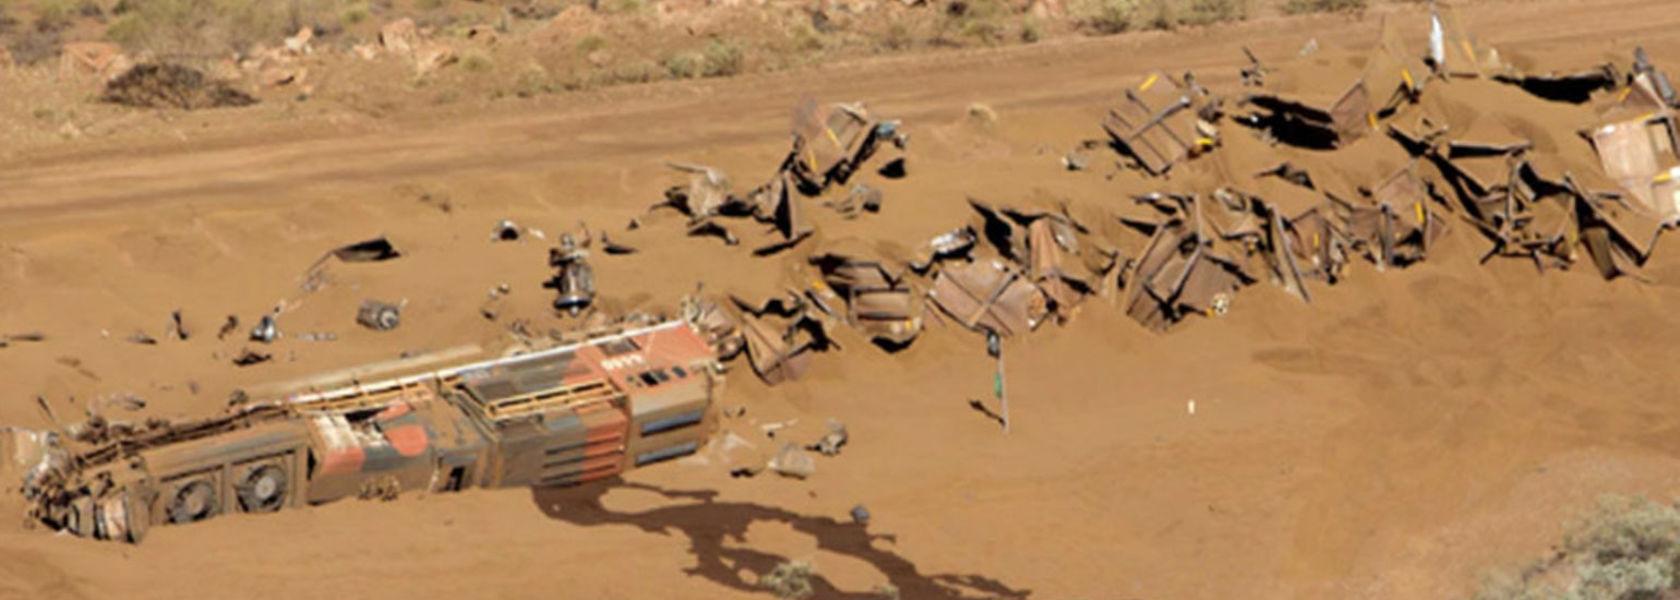 BHP train crash driver dismissed - Mining Magazine